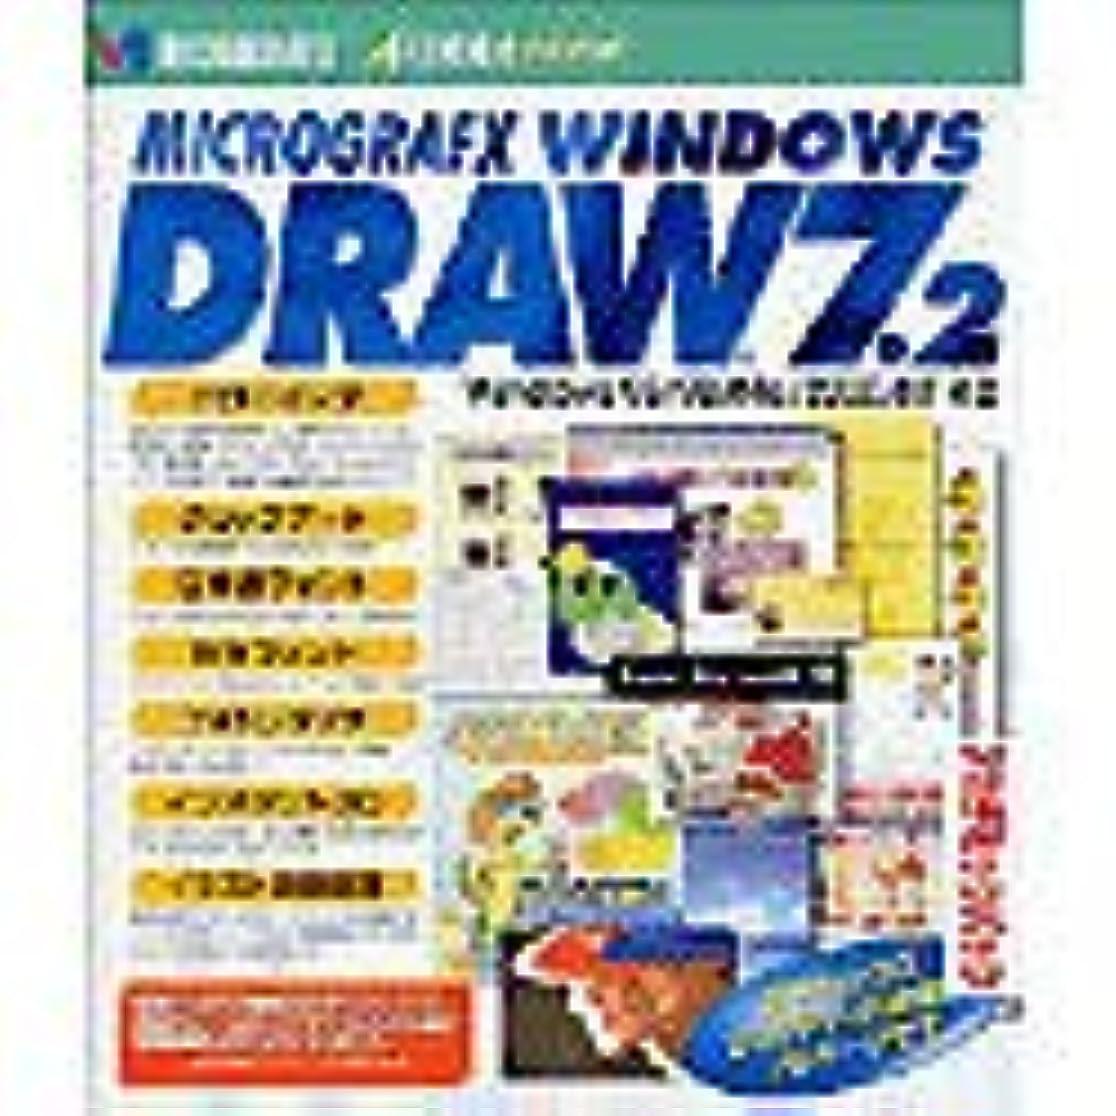 Micrografx Windows DRAW 7.2 アカデミックパック